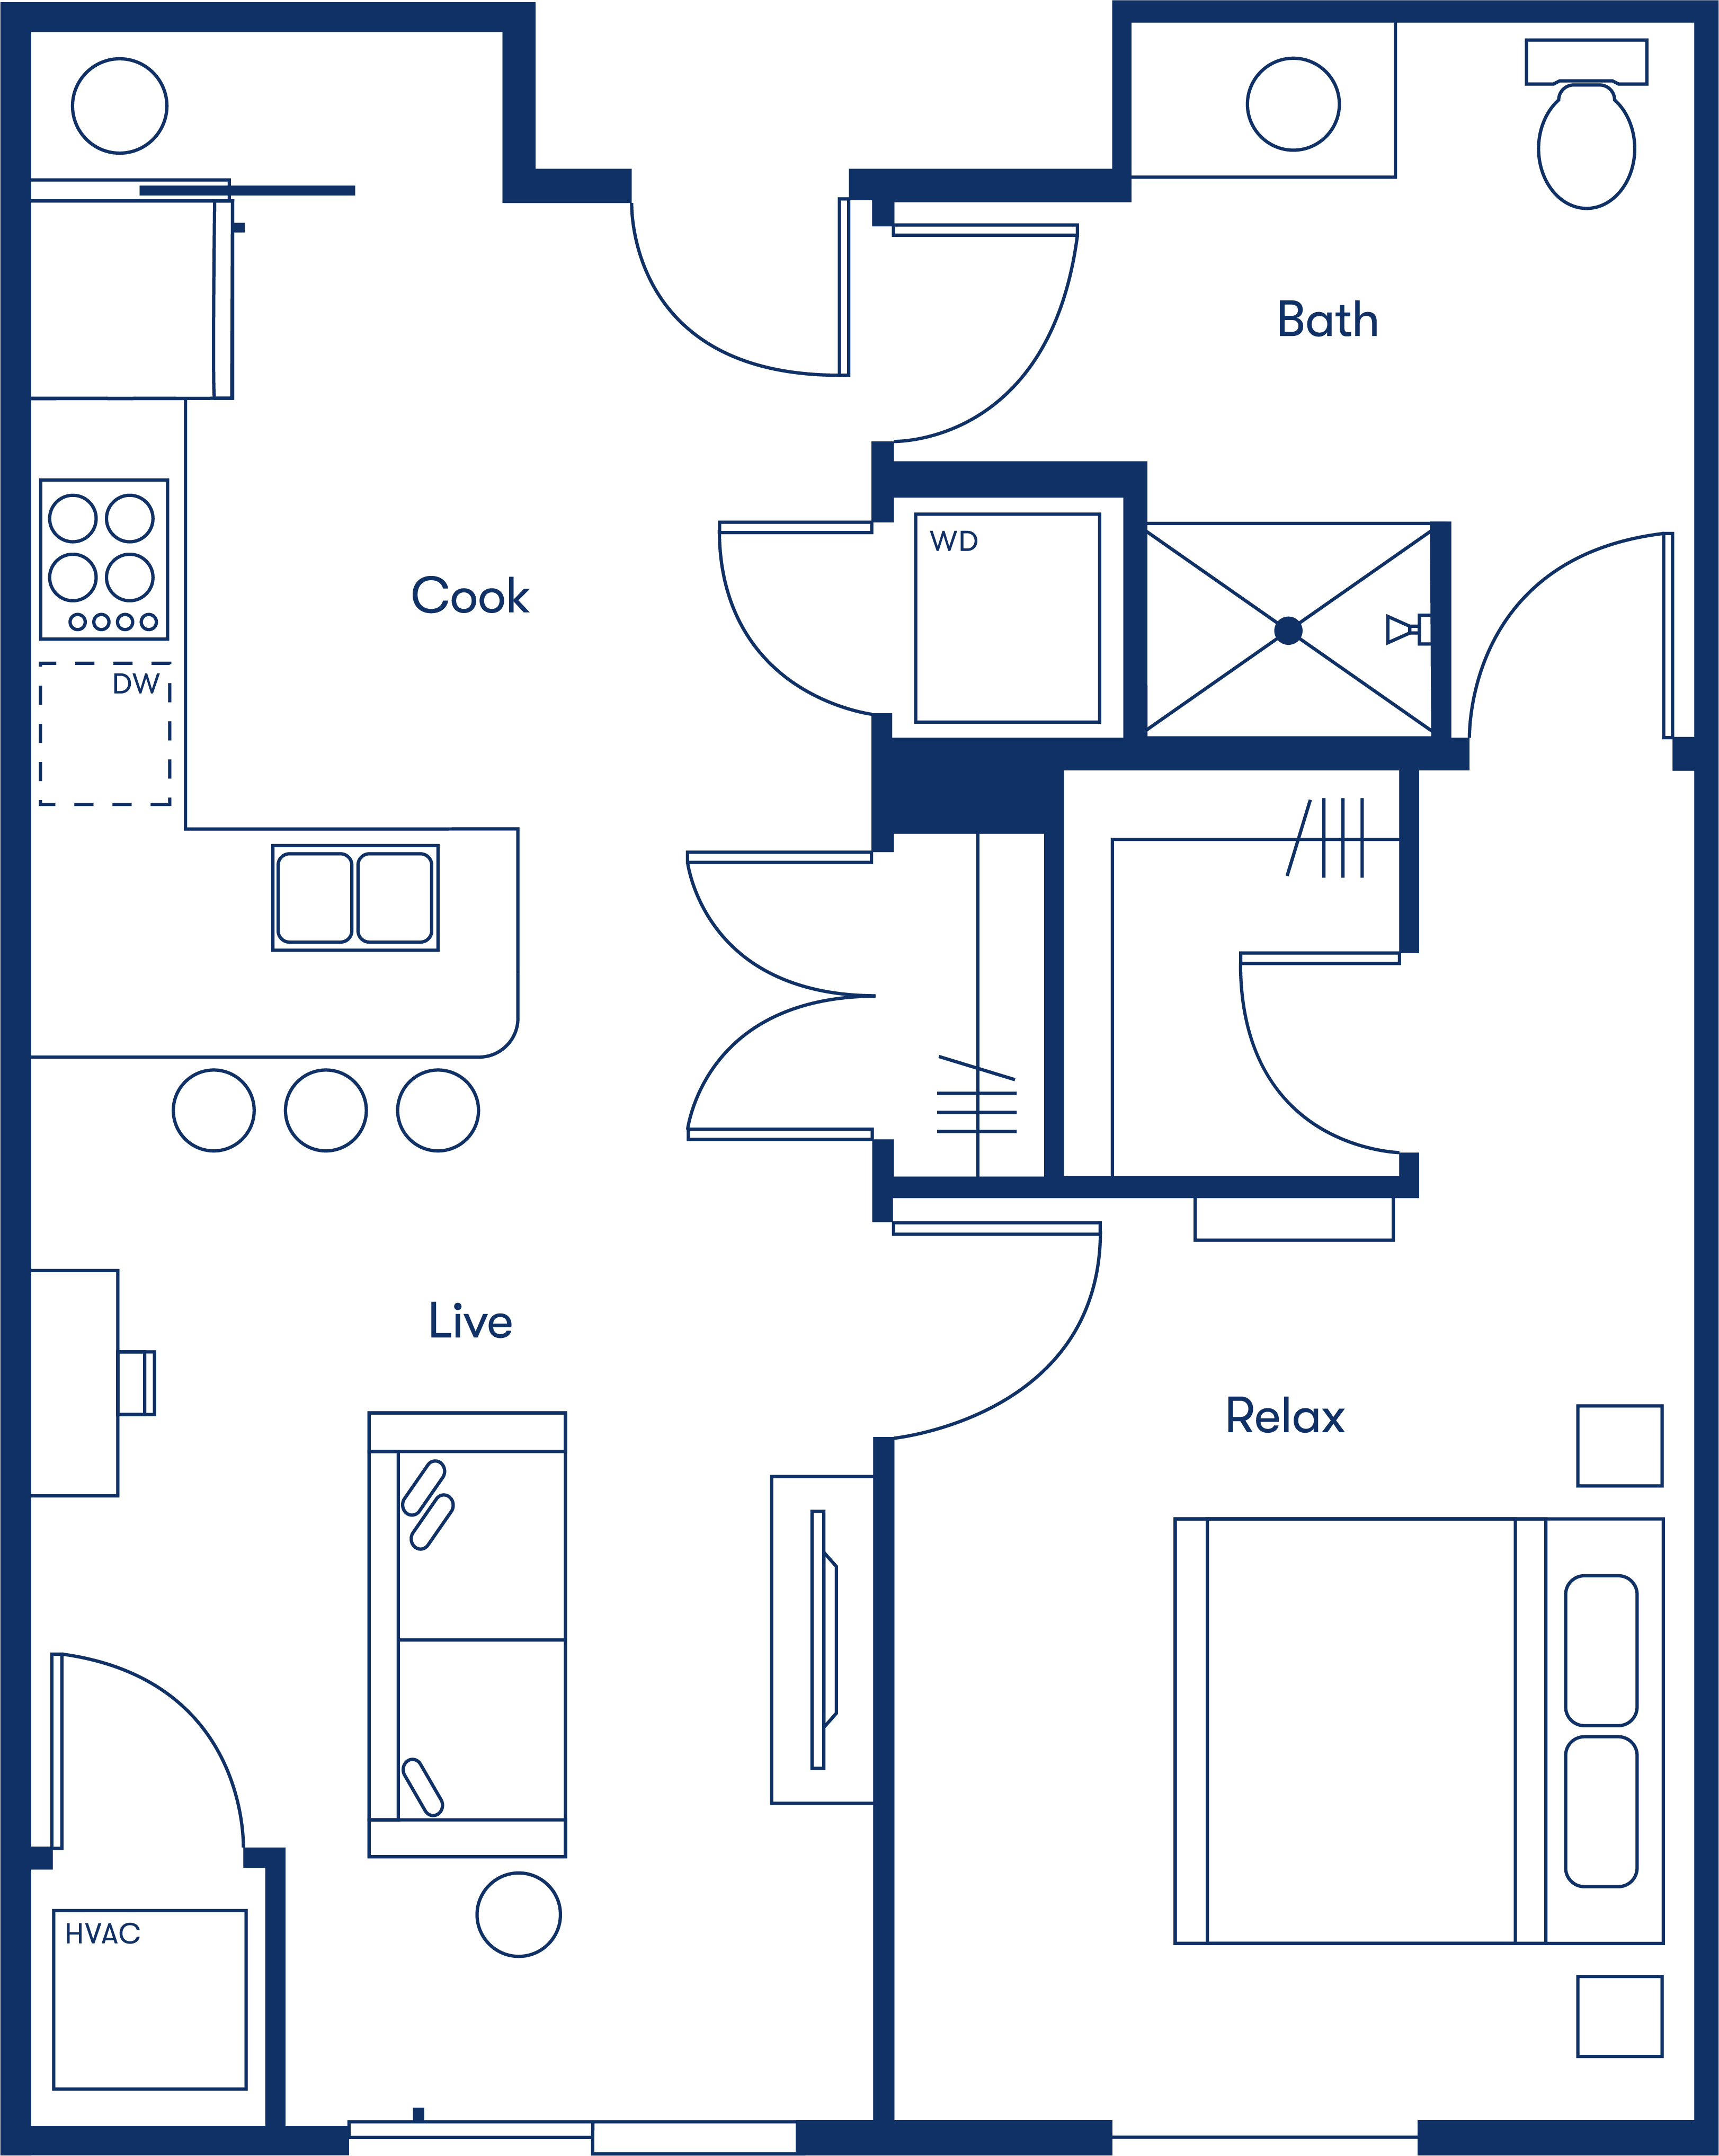 Simple floorplan layout of the 1 Bedroom apartment